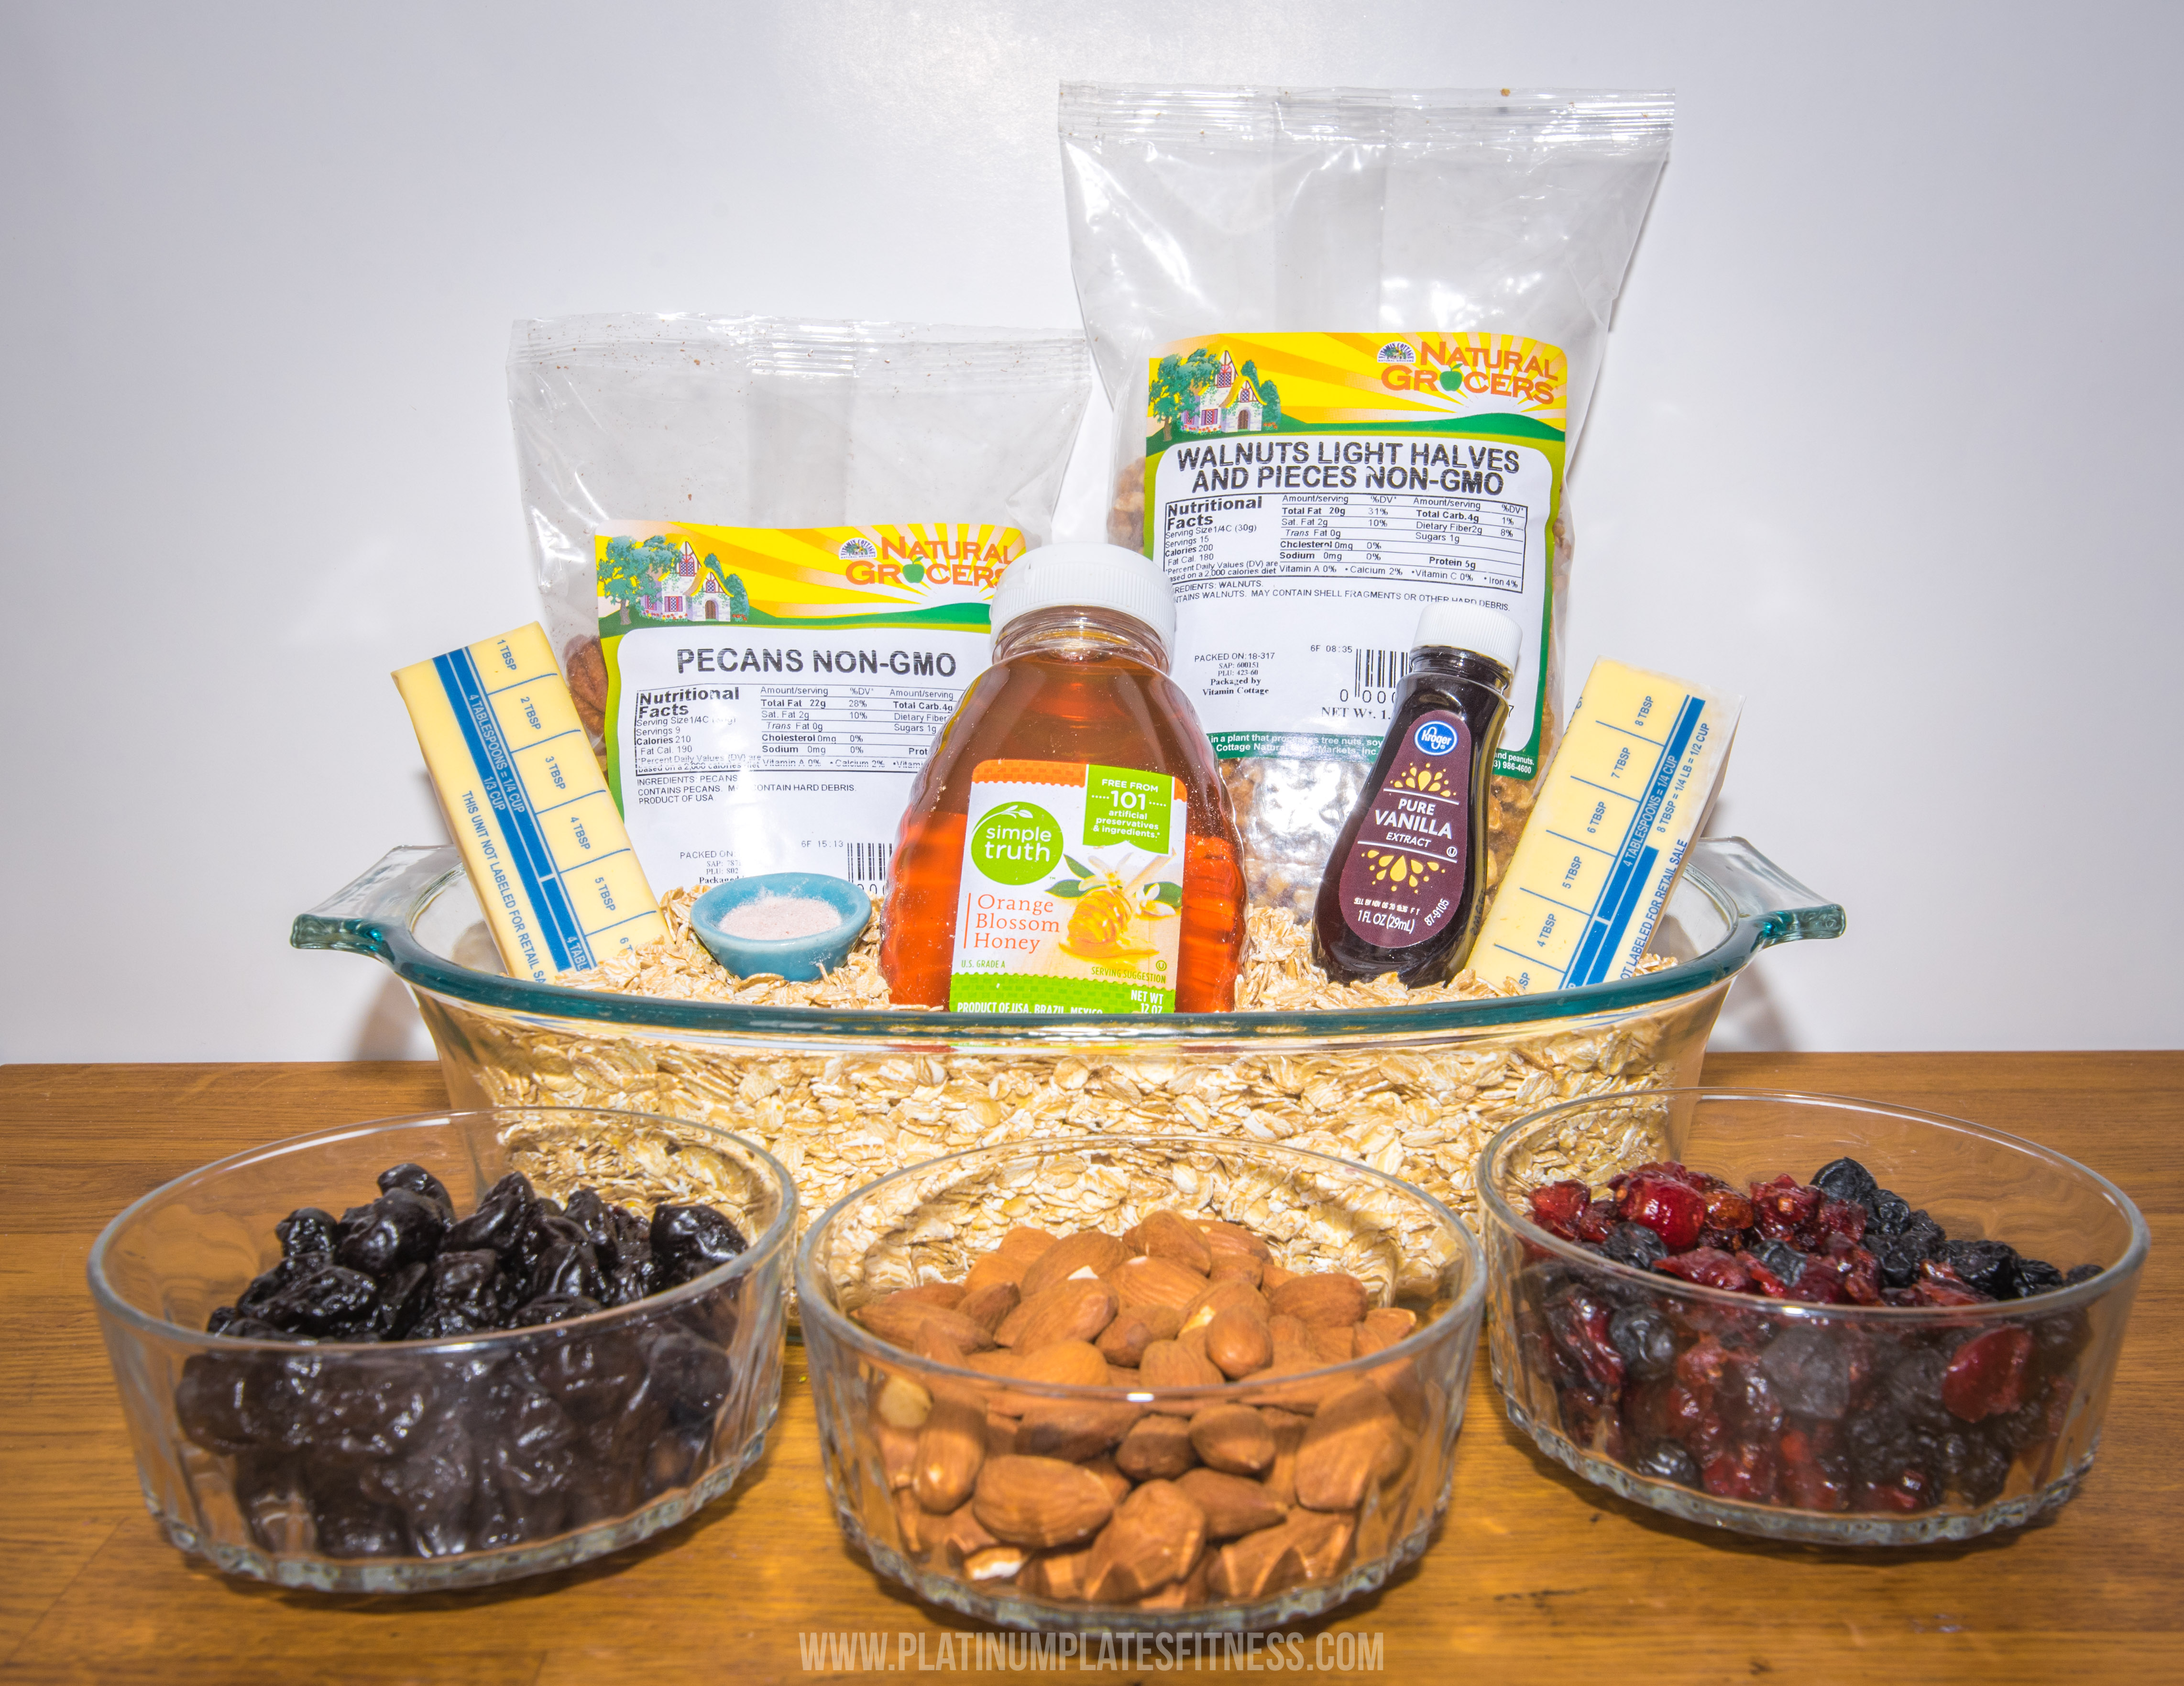 homemade, granola, denver, meal prep, breakfast, yougurt, bowl, berries, healthy, blogger, nutrition